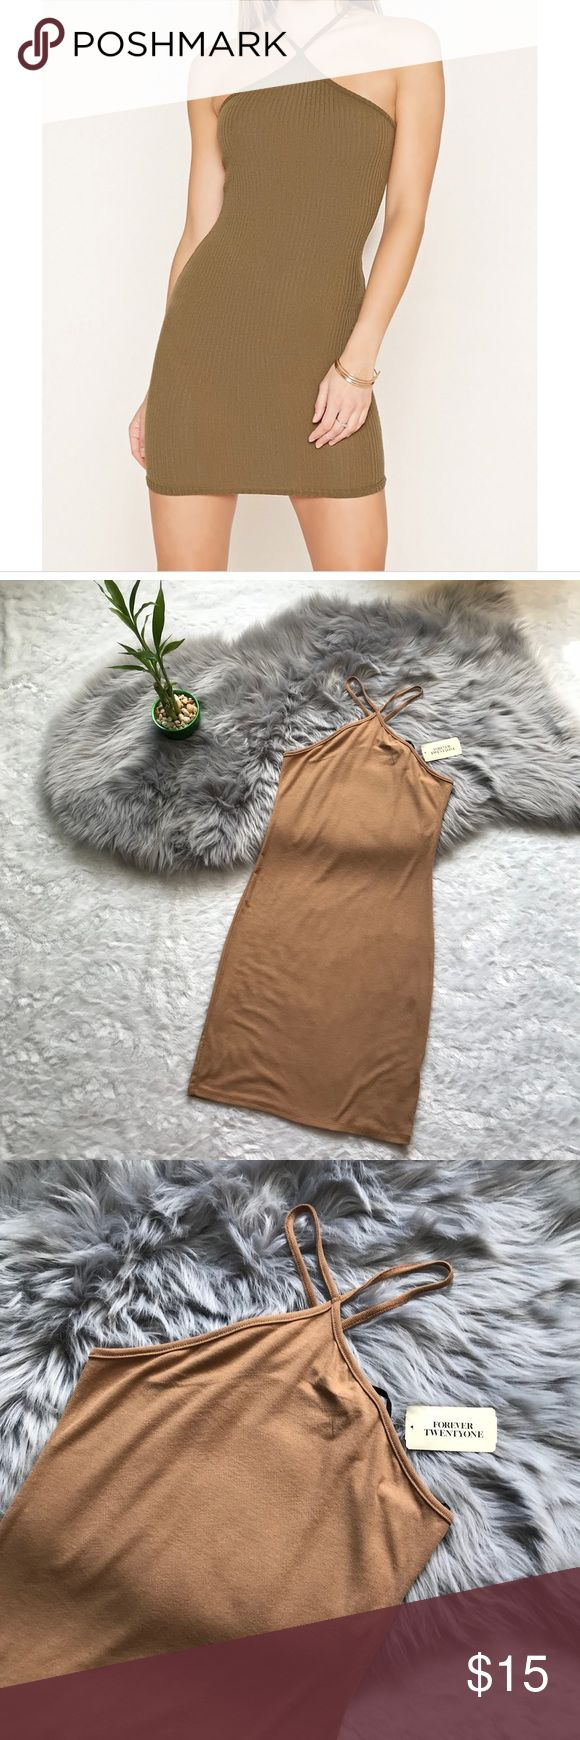 Forever 21 Camel Bodycon Dress Size: Medium Pit to Pit: 14 Length: 32.5 Dress has plenty of Stretch Forever 21 Dresses Mini